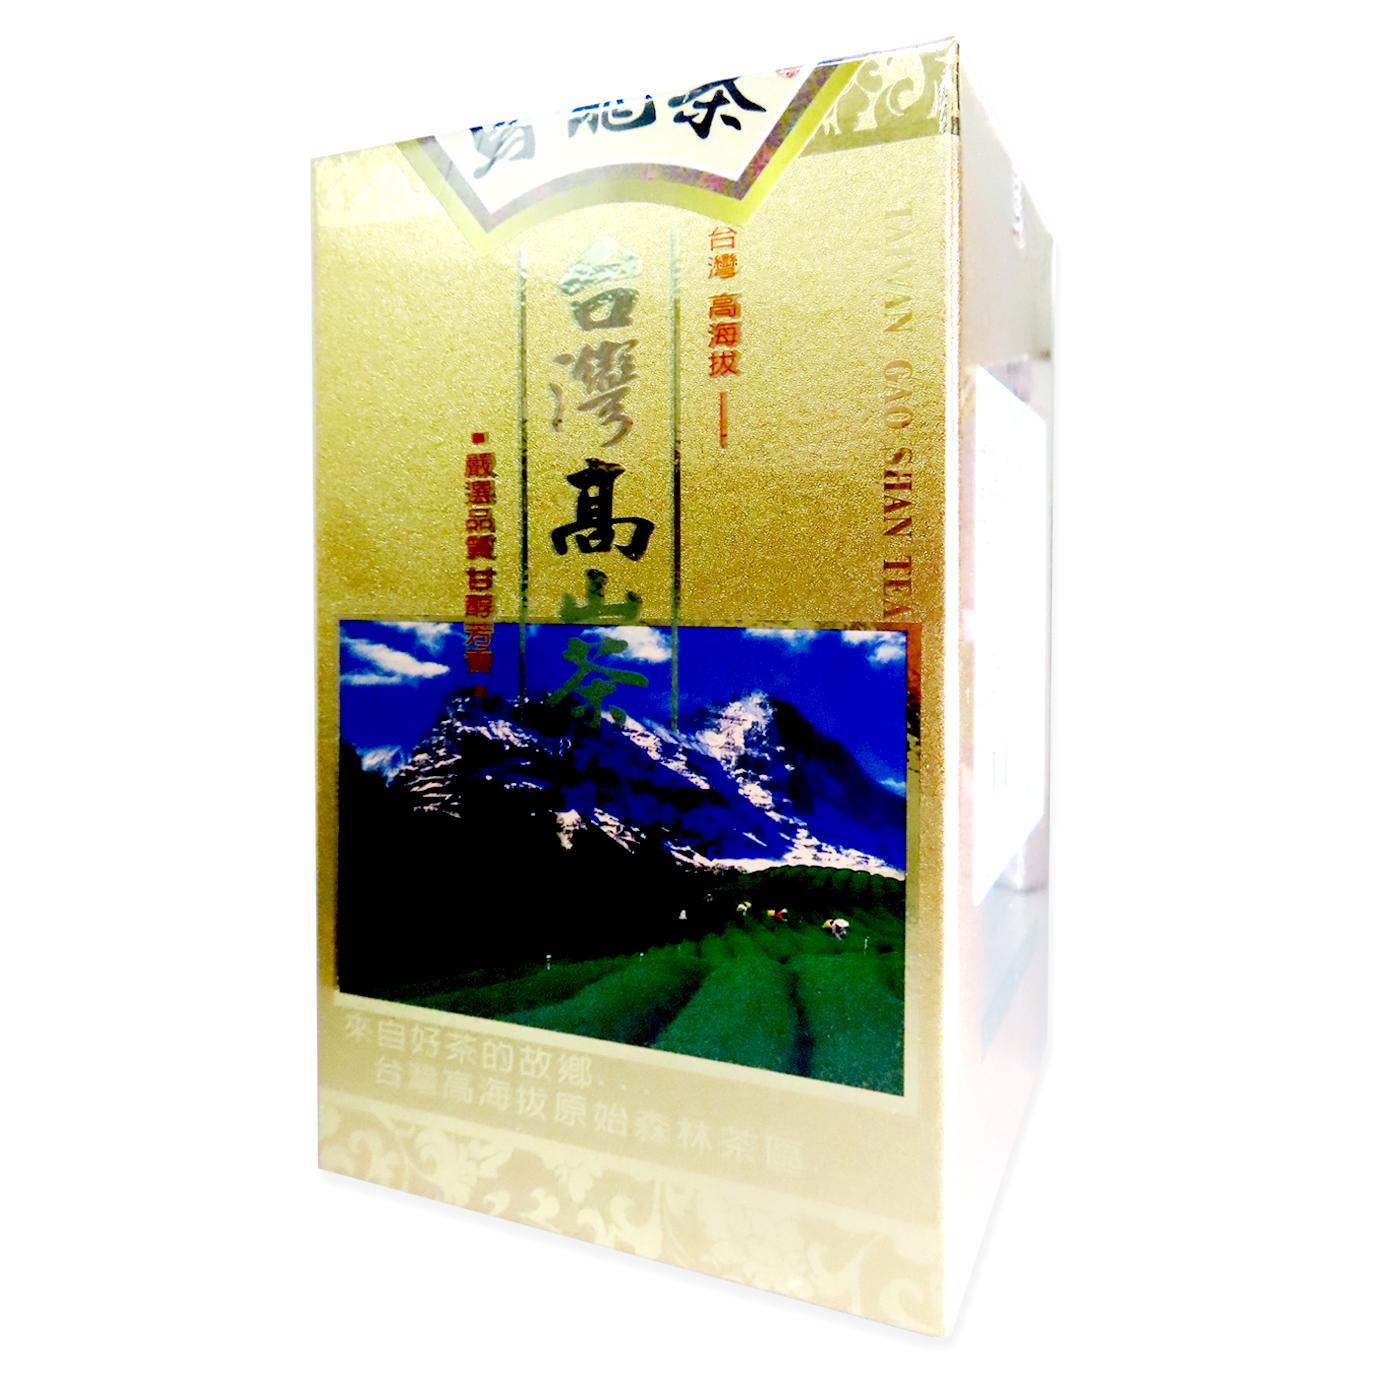 Image Gao Shan Oolong Tea 高山乌龙茶 150grams